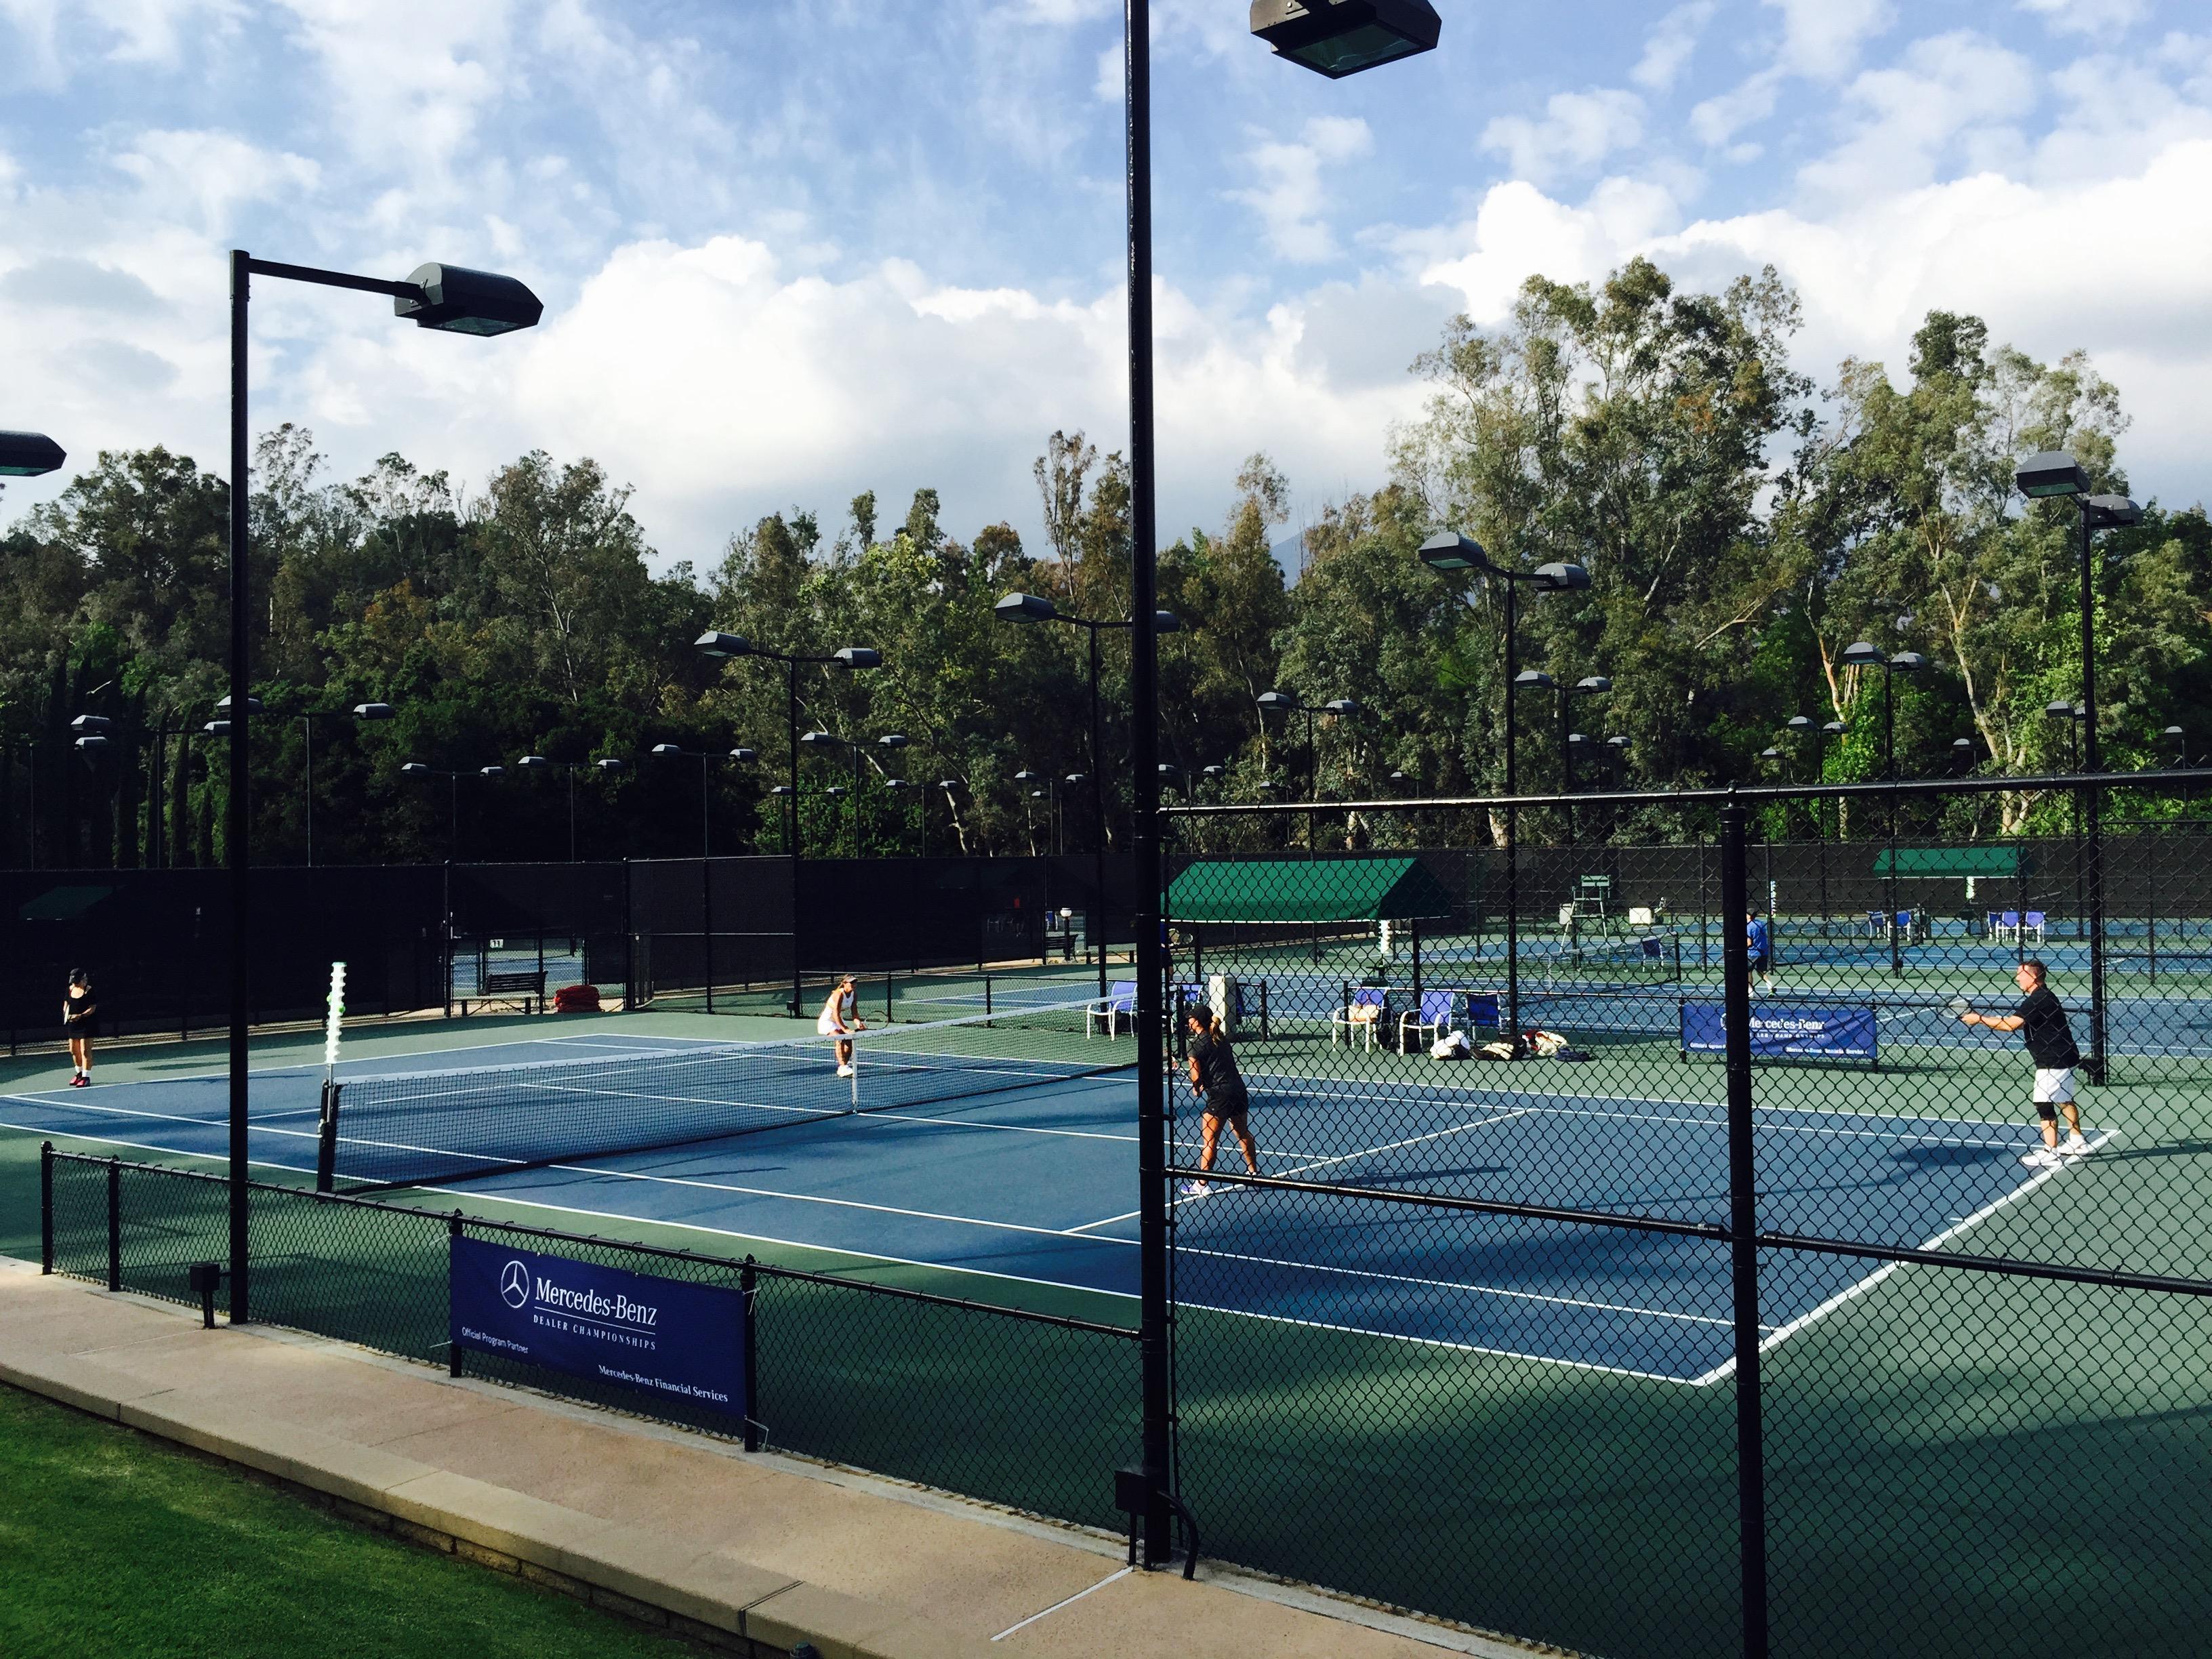 Rusnak arcadia hosts mercedes dealer tennis championship for Rusnak mercedes benz arcadia